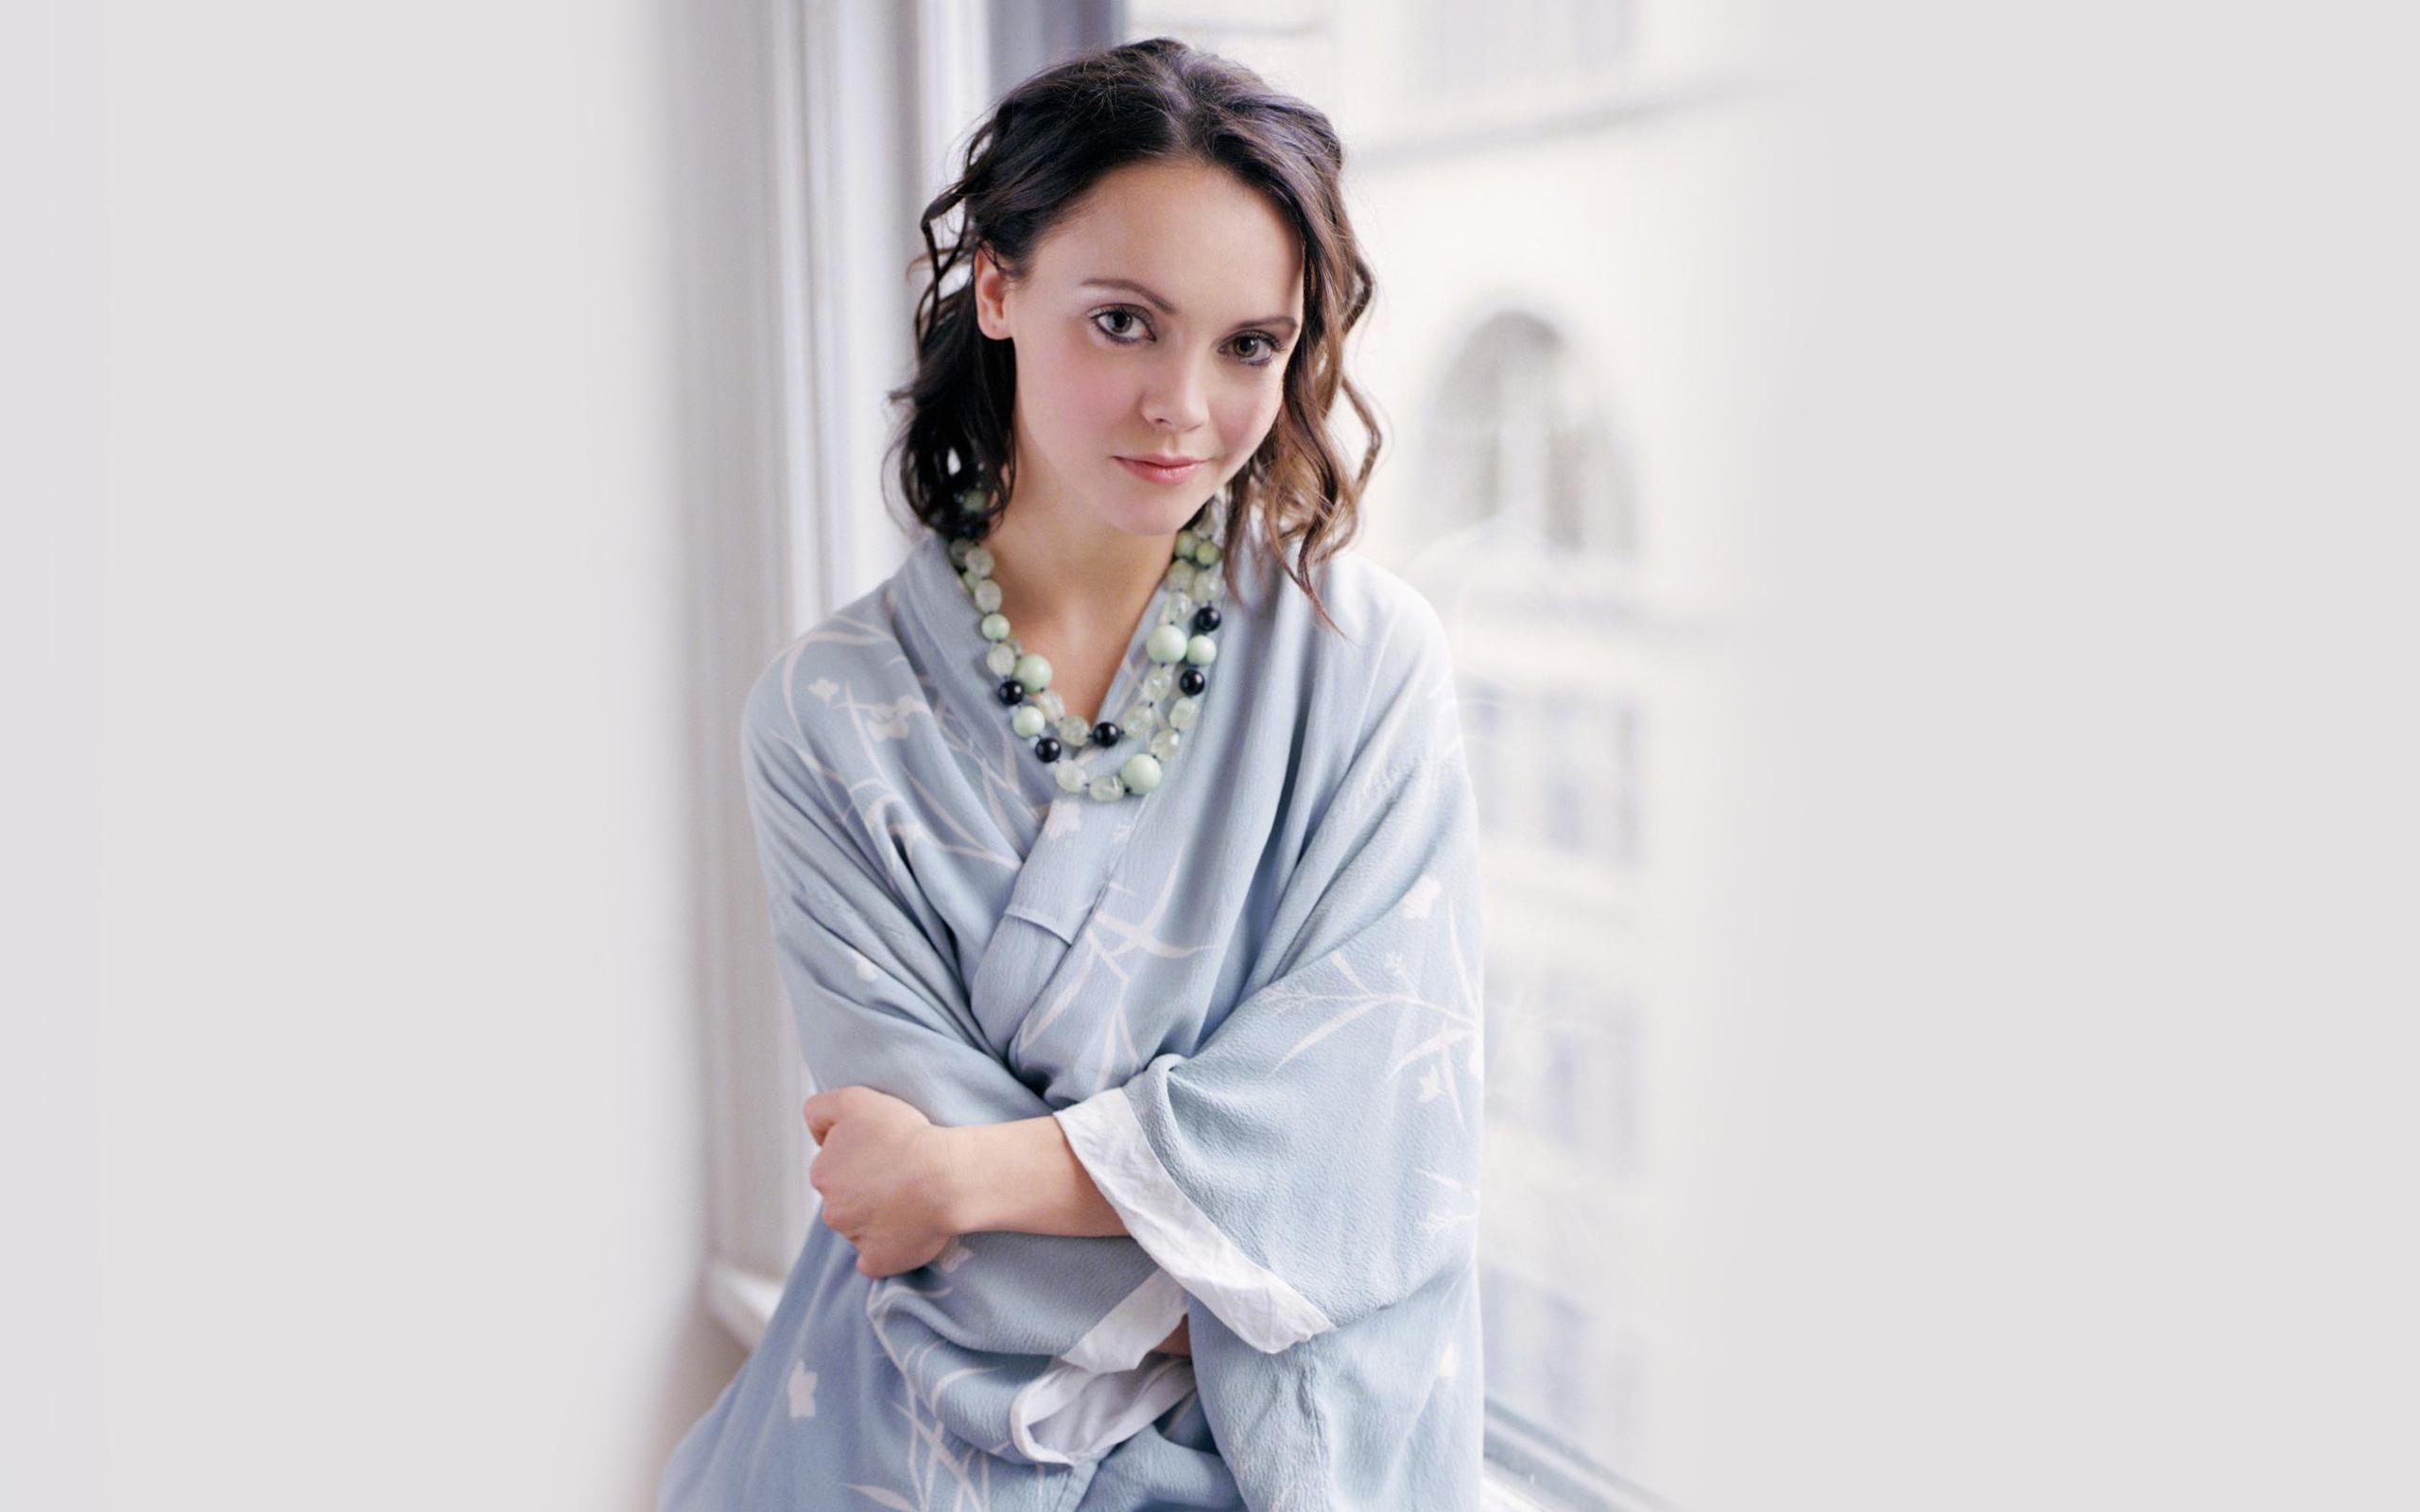 christina ricci wallpaper background 53214